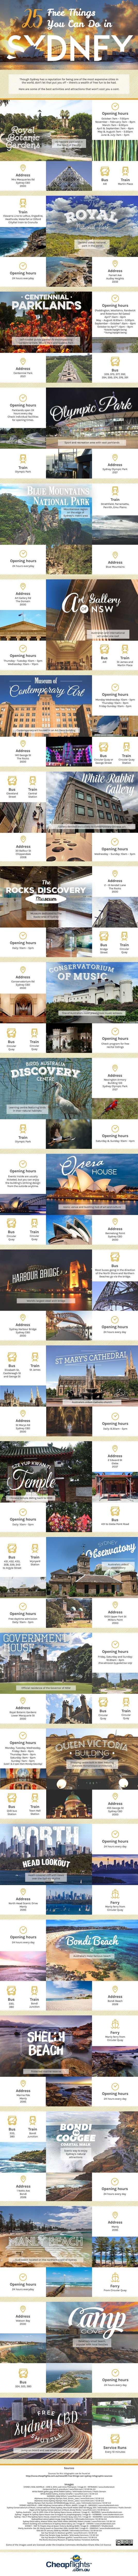 25 gratis dingen om te doen in Sydney, Australië.